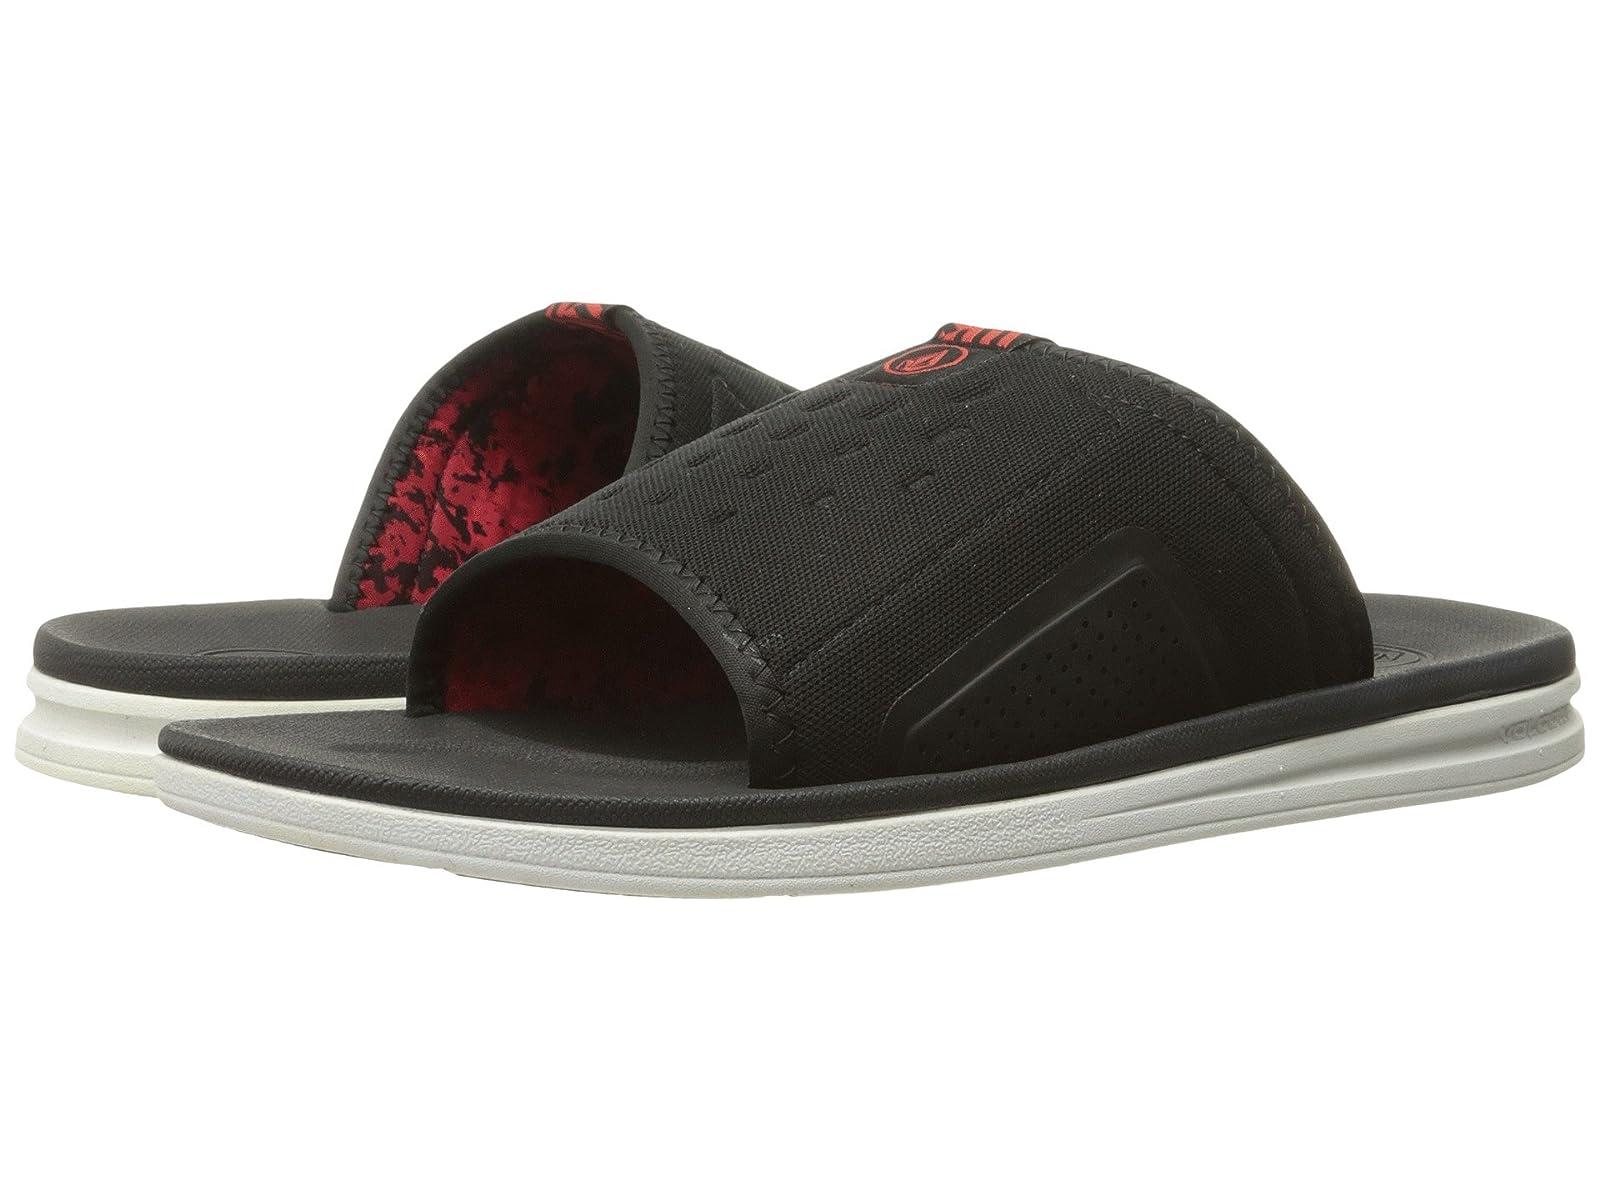 Volcom Draft SlideCheap and distinctive eye-catching shoes